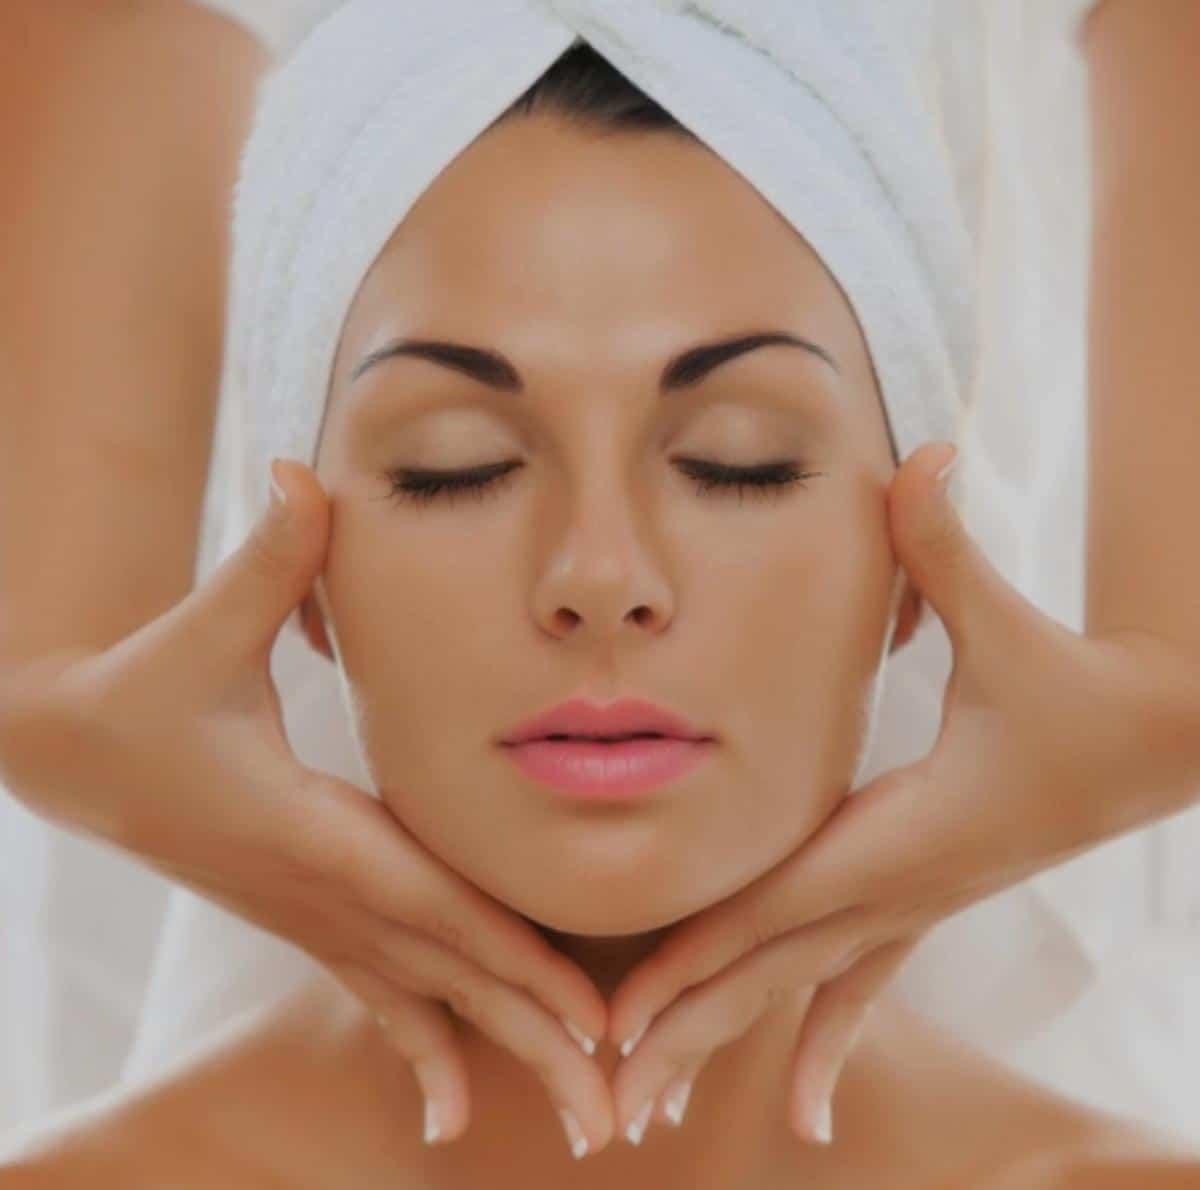 Facial-Spa-Treatments